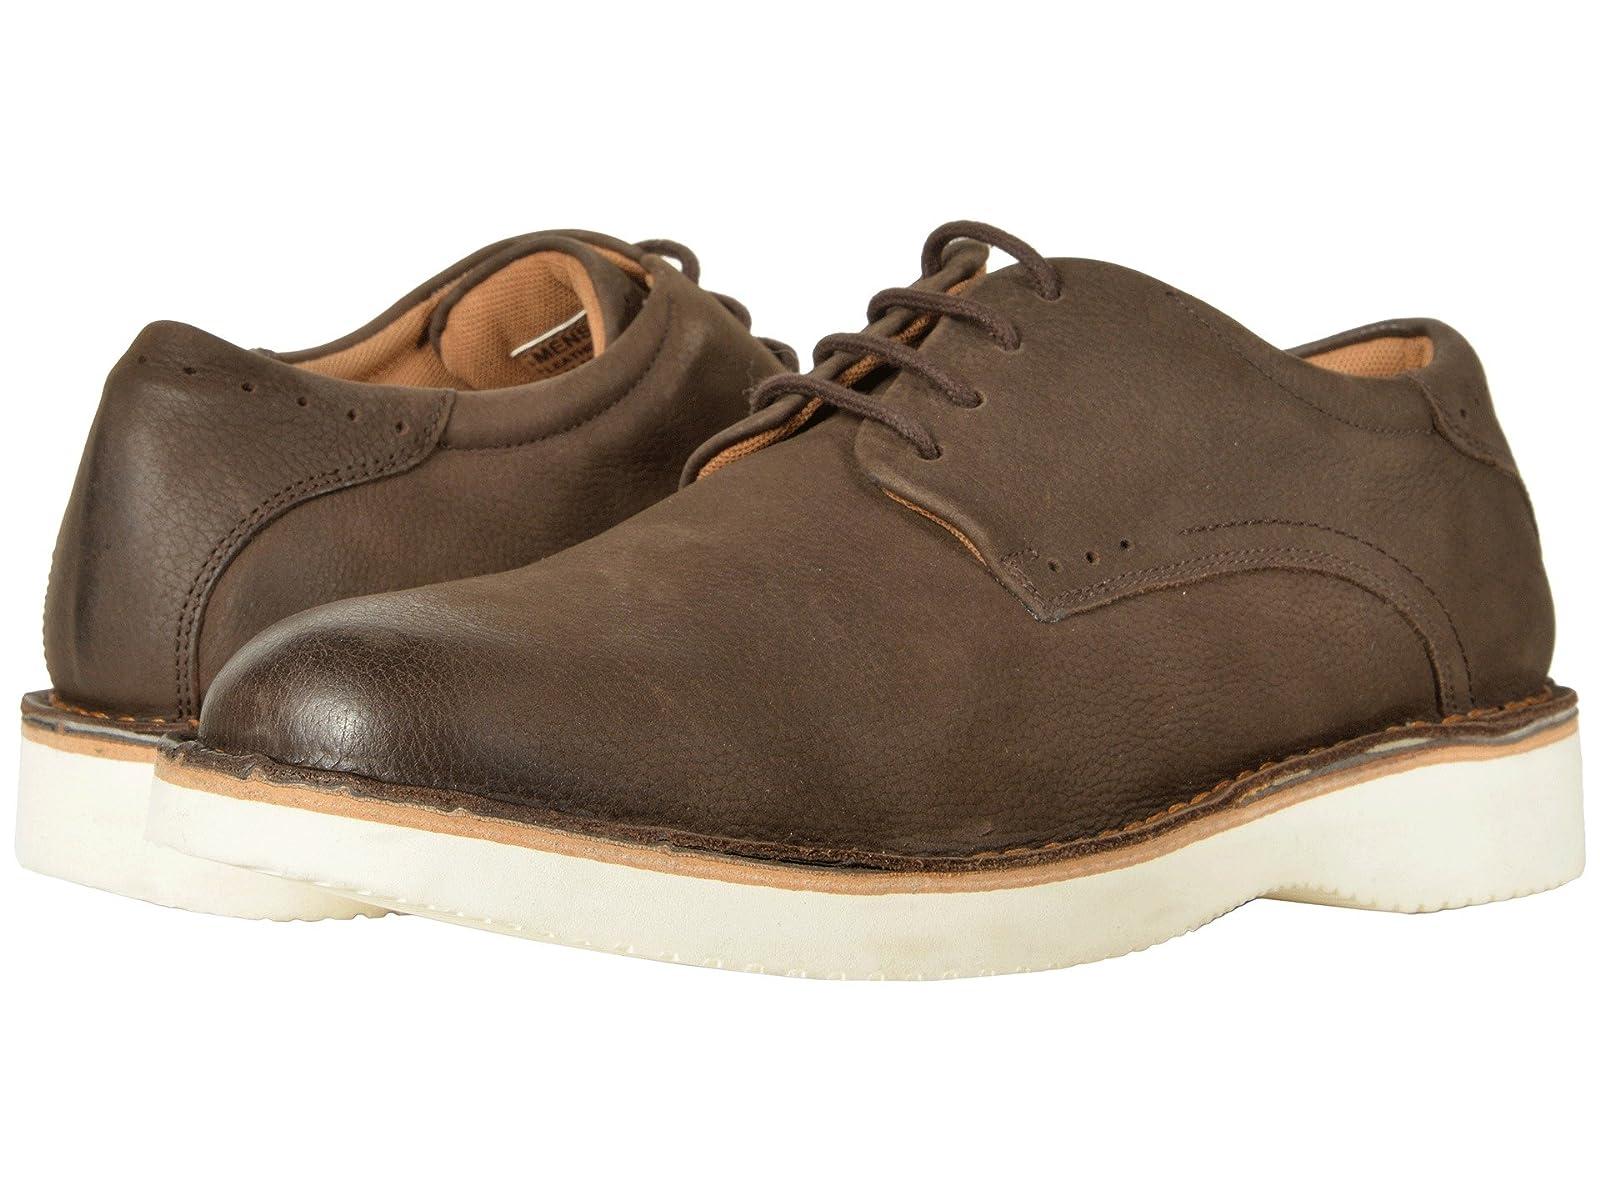 Florsheim Navigator Plain Toe OxfordCheap and distinctive eye-catching shoes